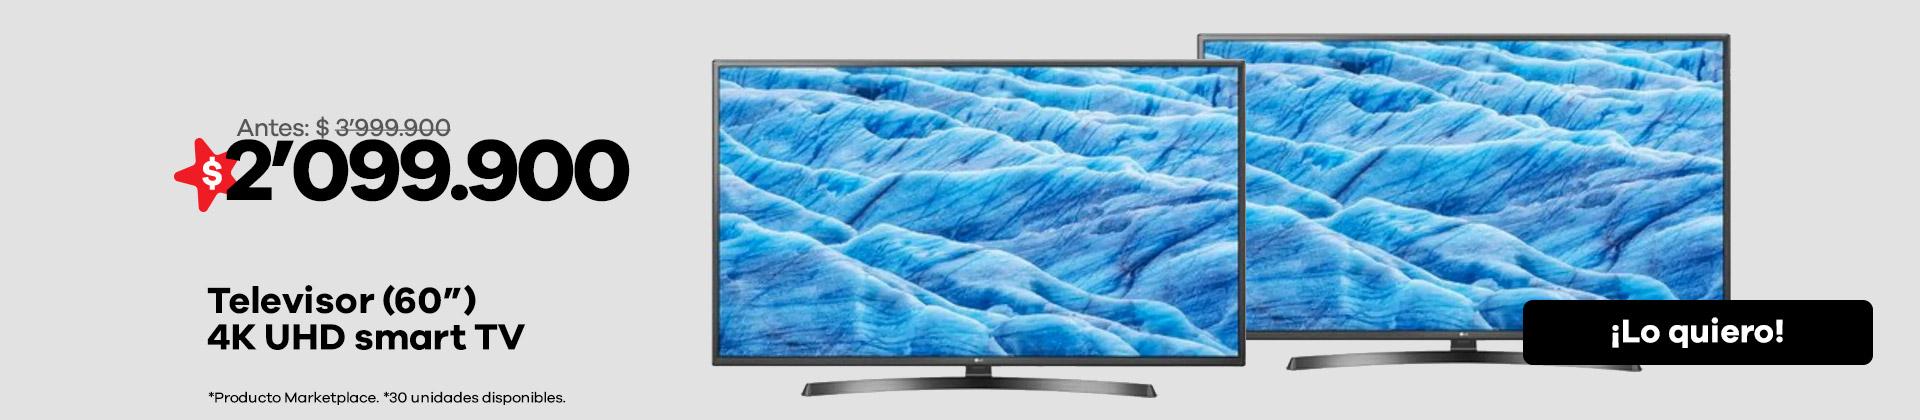 televisor-lg-60-pulgadas-4k-uhd-smart-tv-60